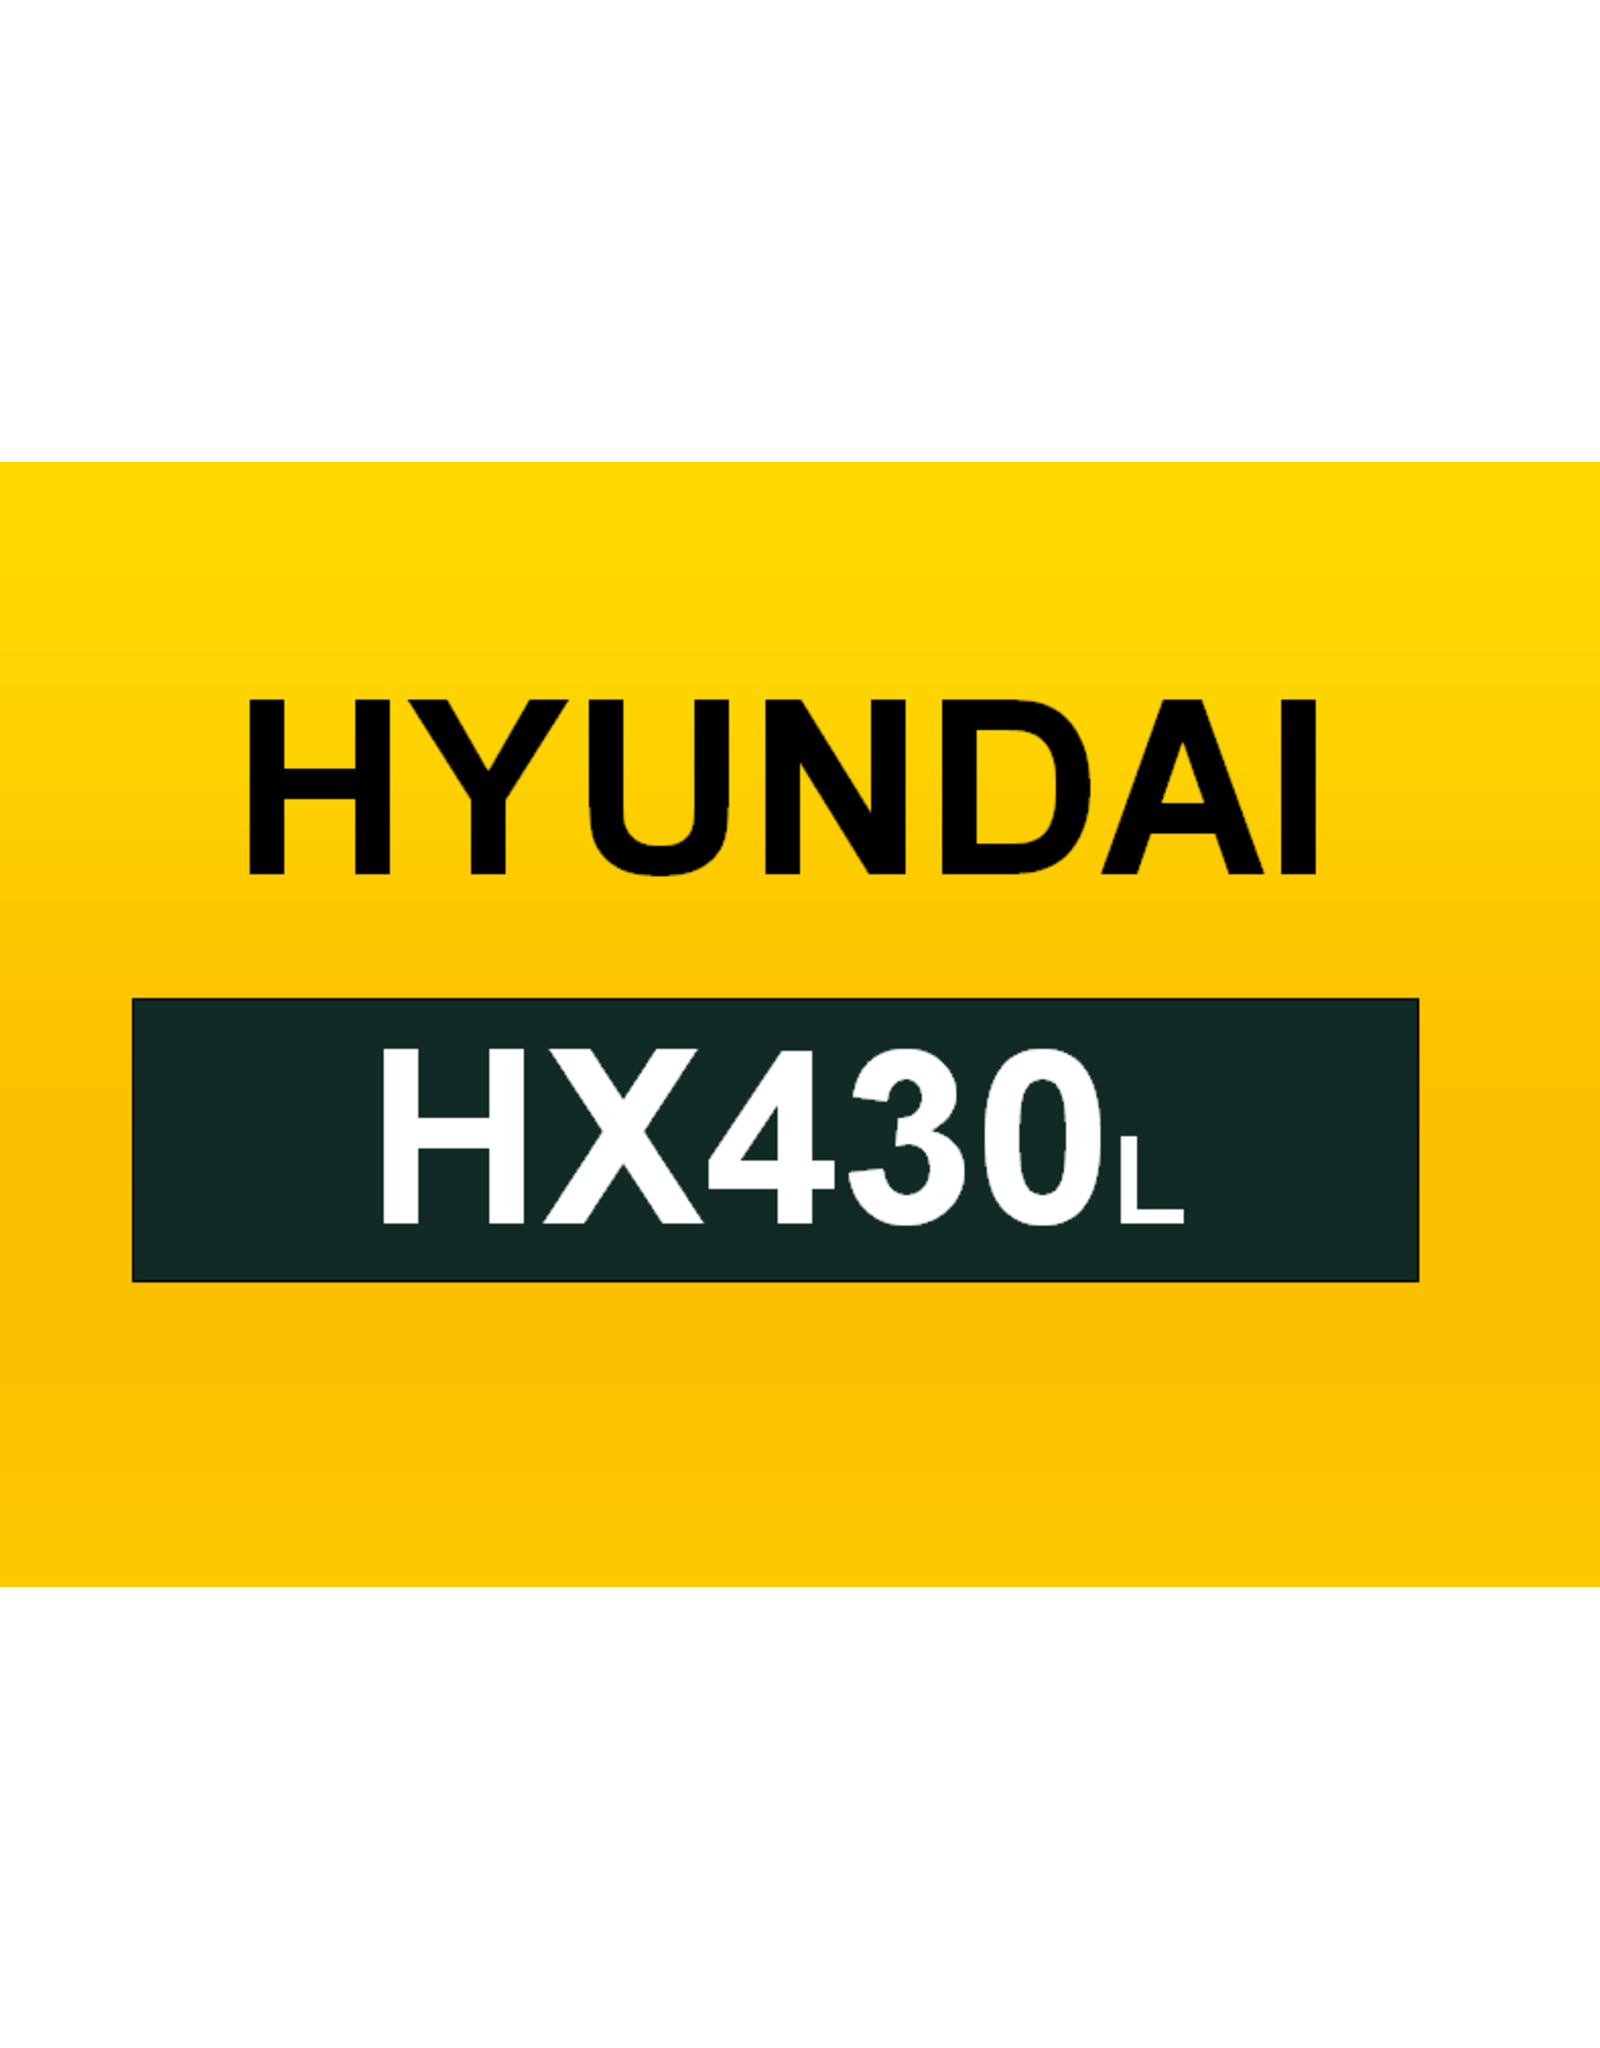 Echle Hartstahl GmbH FOPS for Hyundai HX430L